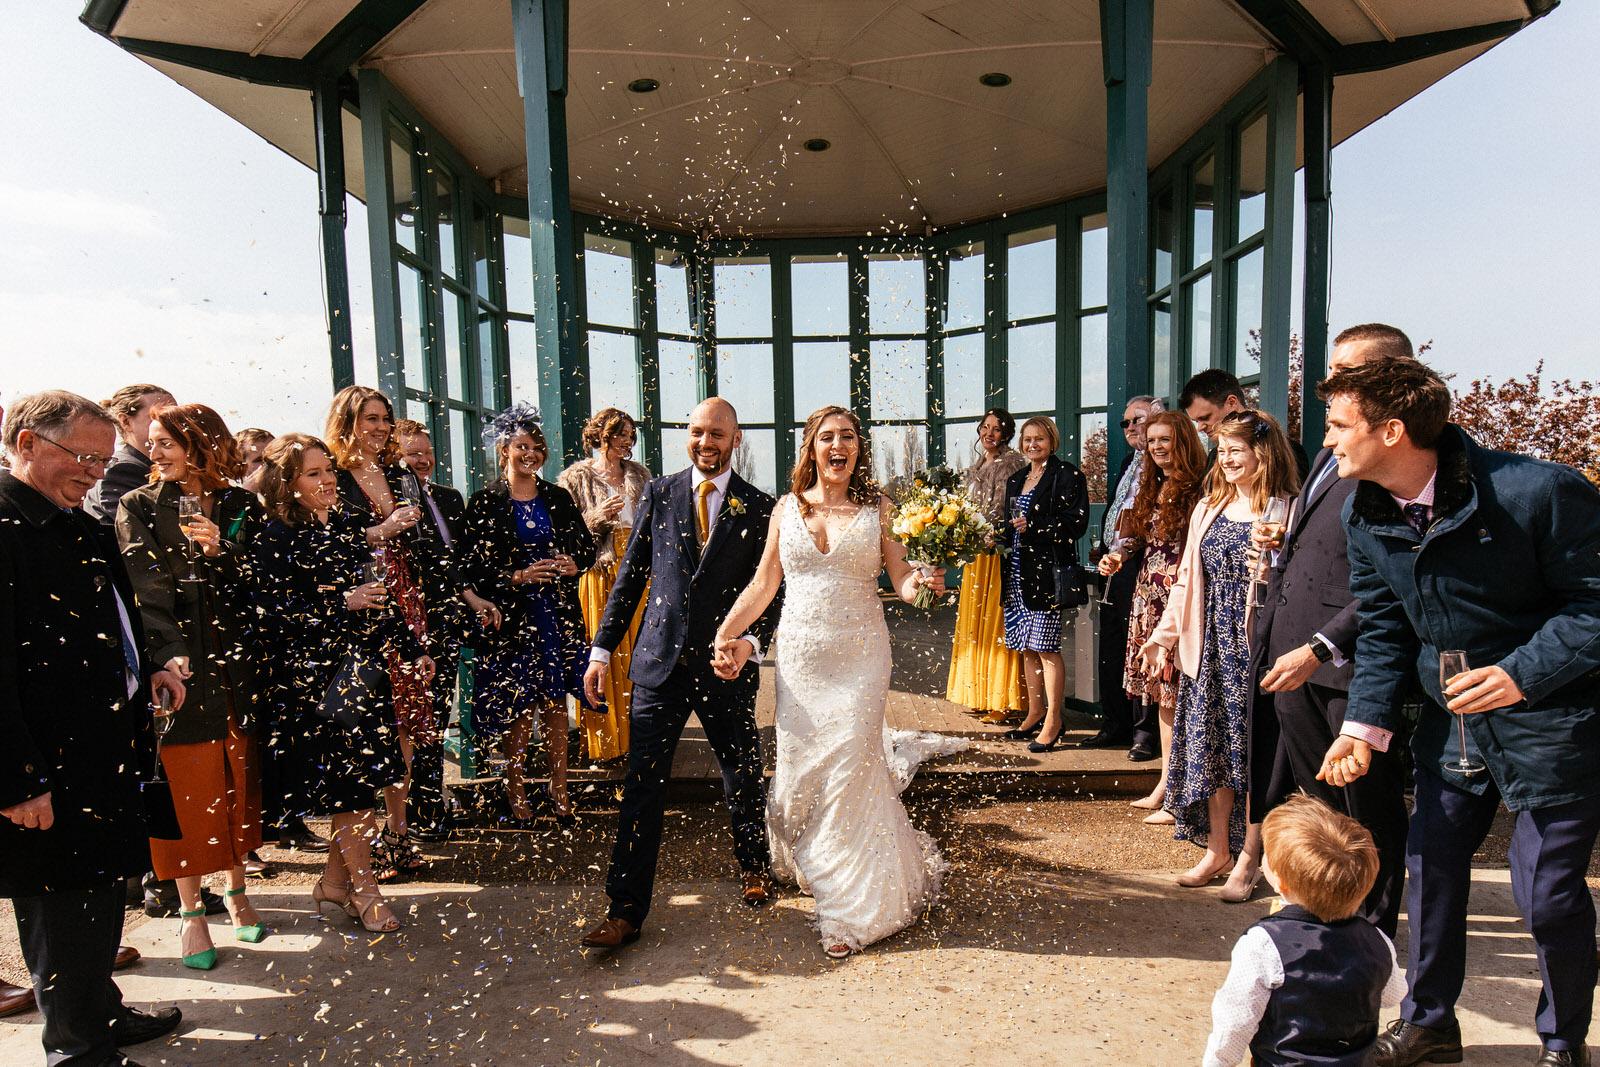 Jenni-and-James-Wedding-Highlights-25.jpg